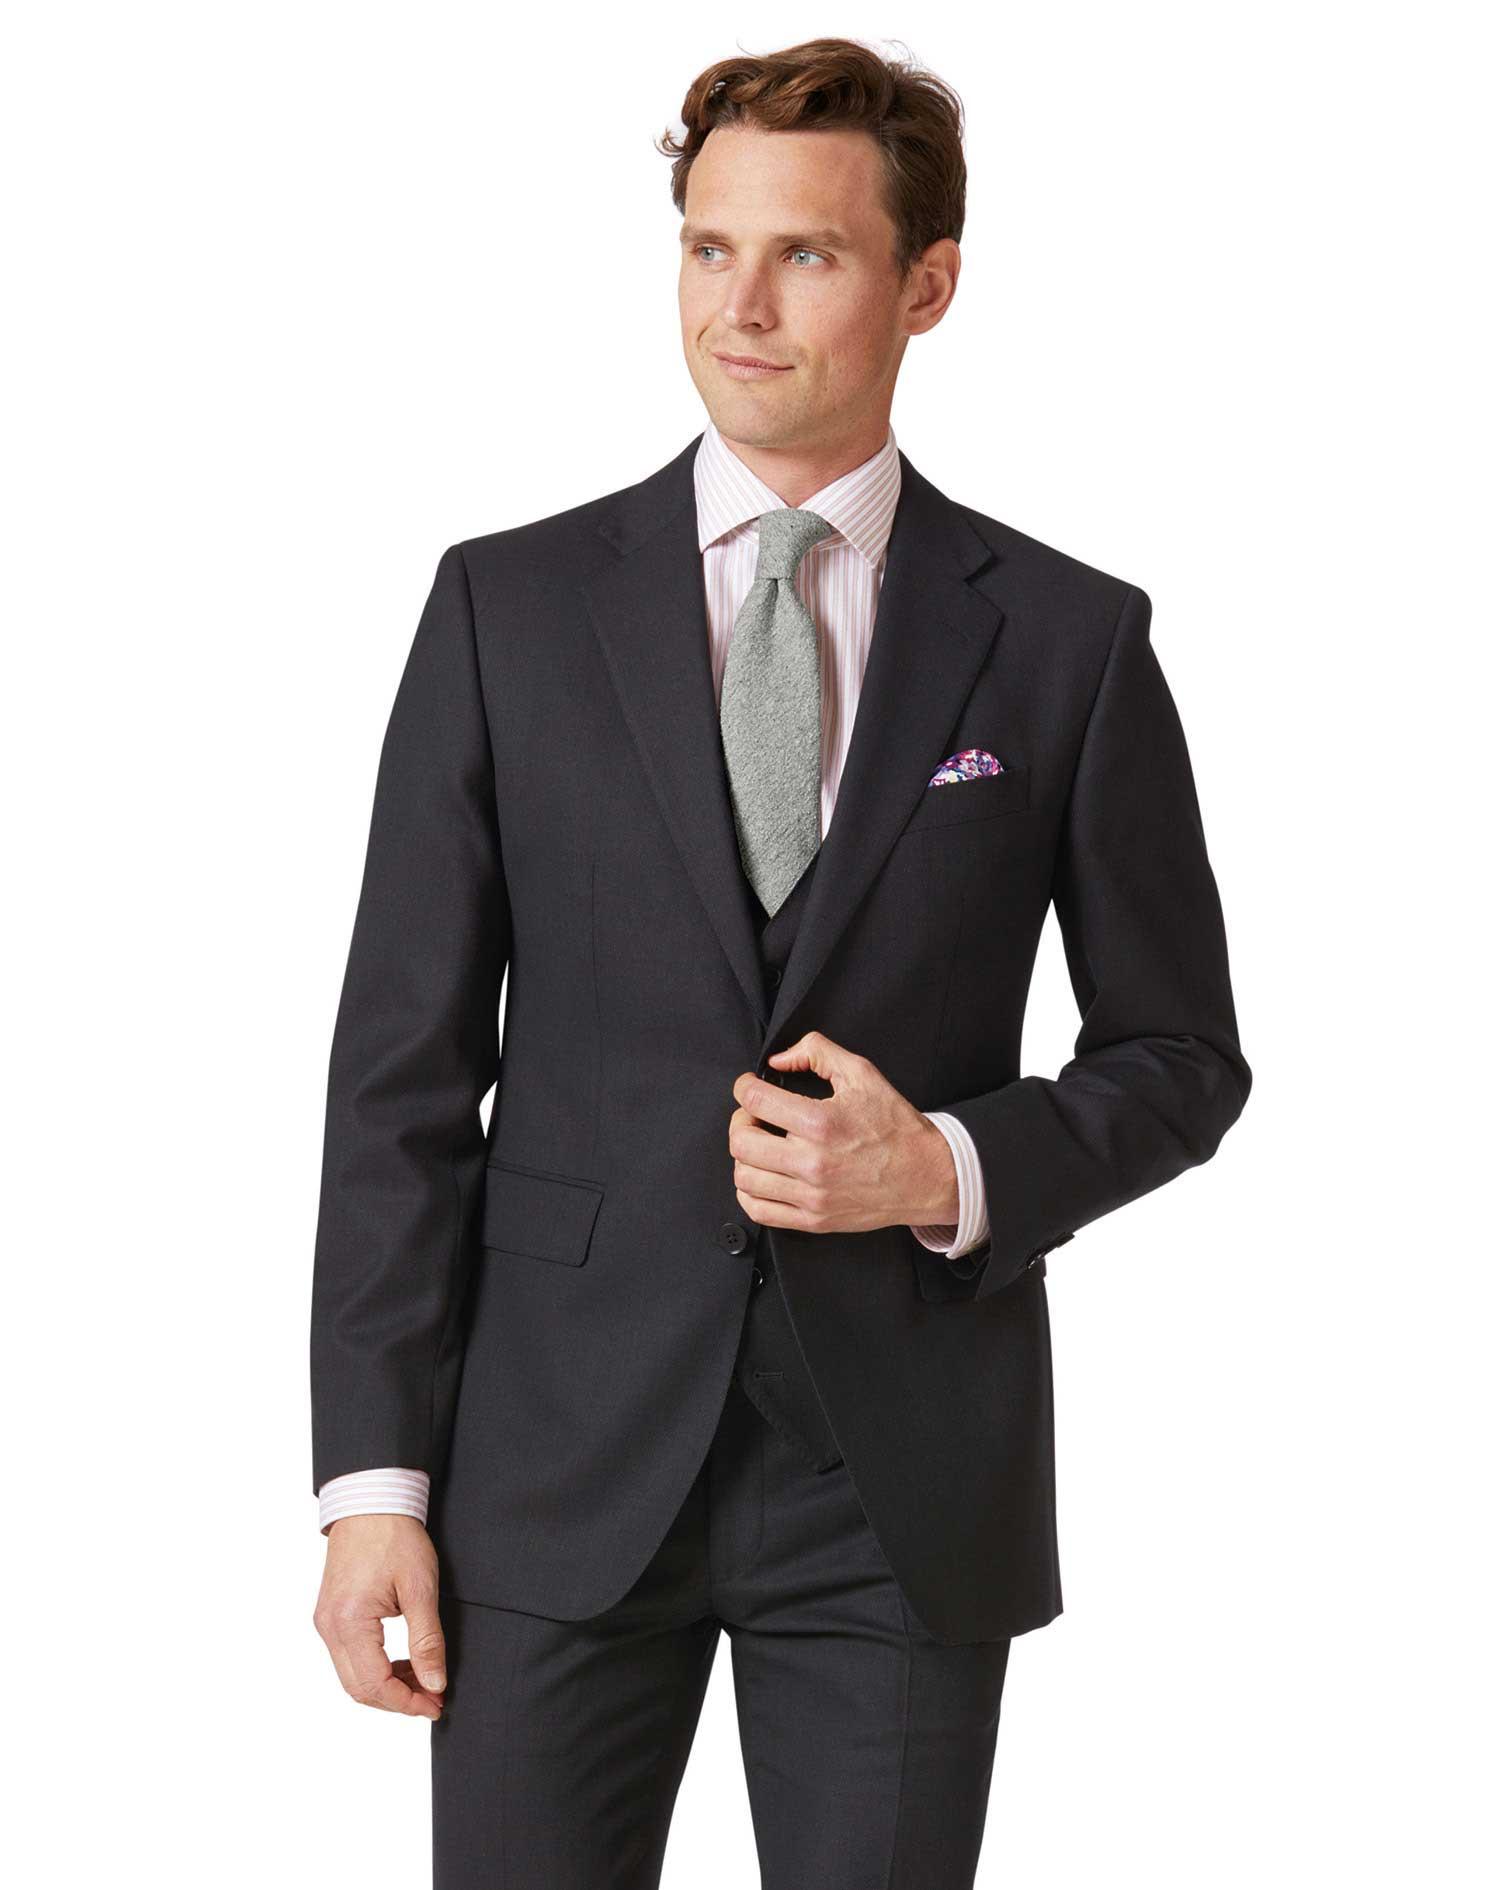 Charcoal Slim Fit Birdseye Travel Suit Wool Jacket Size 40 Regular by Charles Tyrwhitt